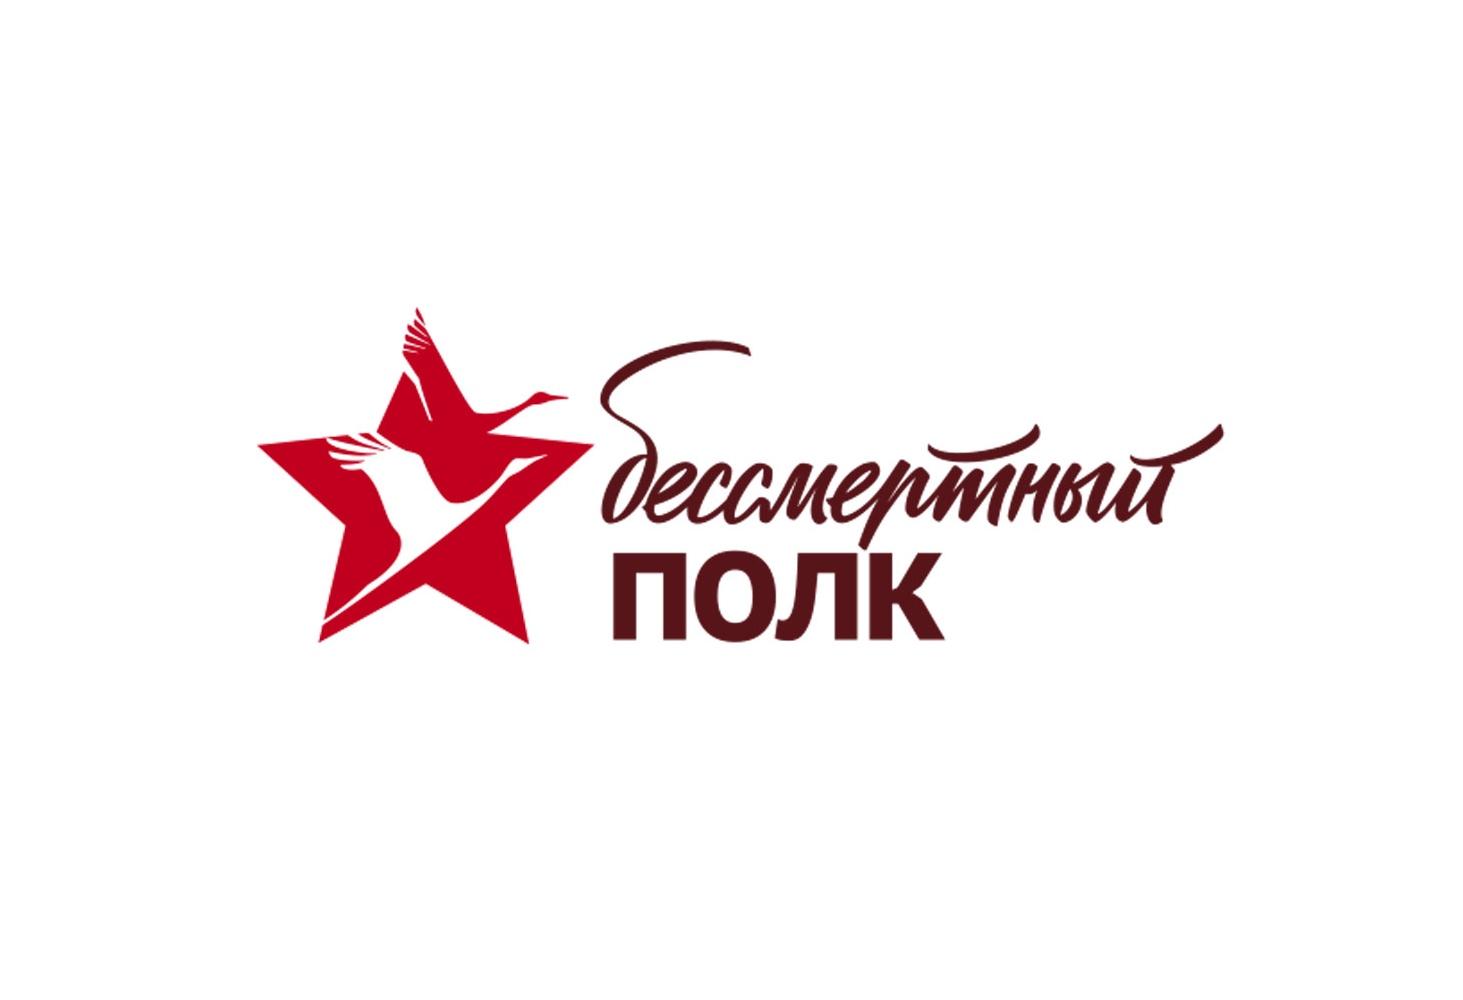 borodaev-aleksandr-egorovich